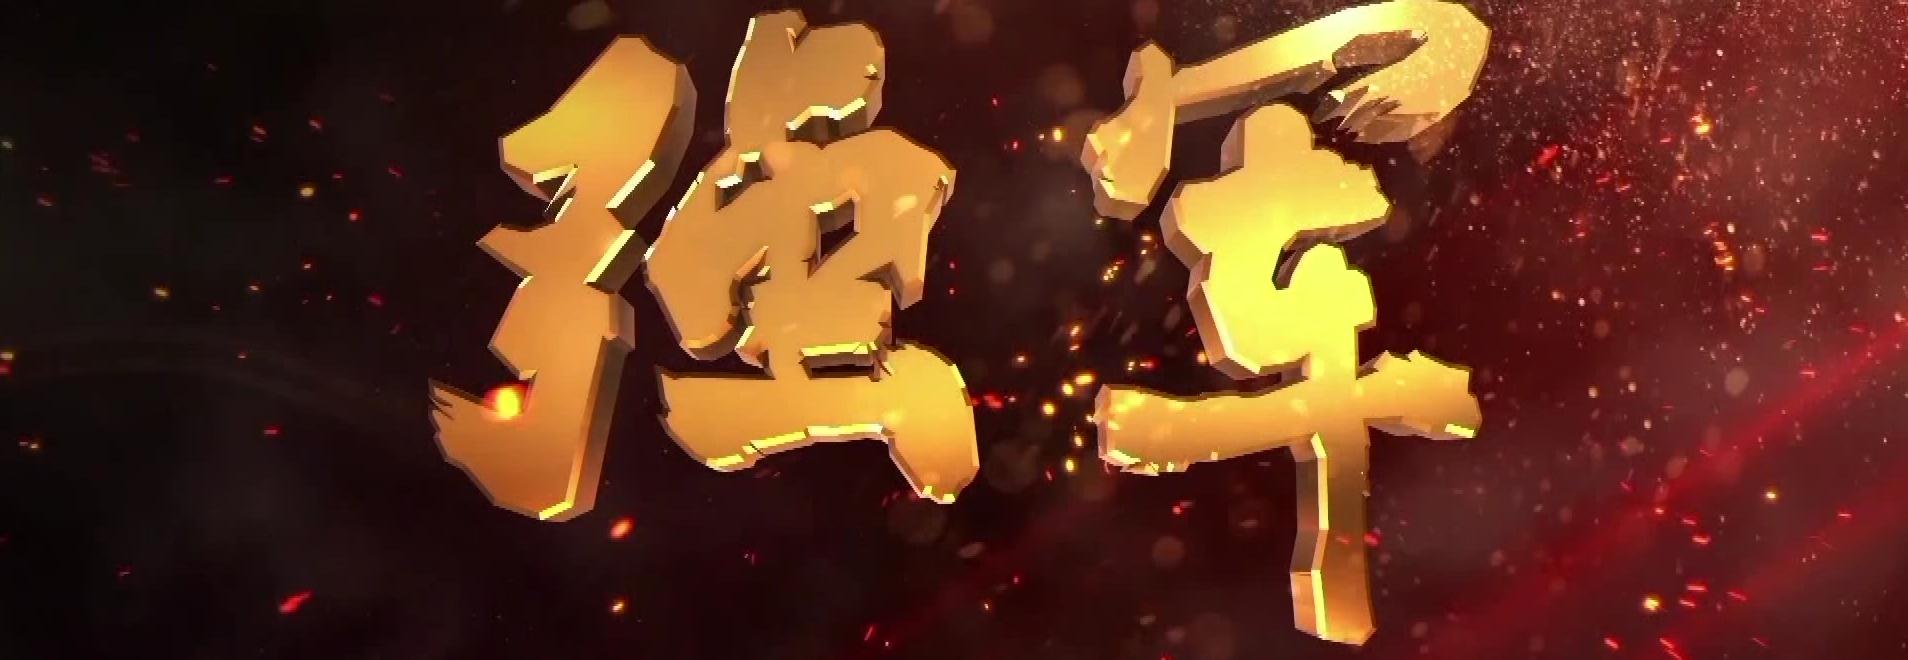 CCTV-强军(全8集)/MP4/国语内嵌中字